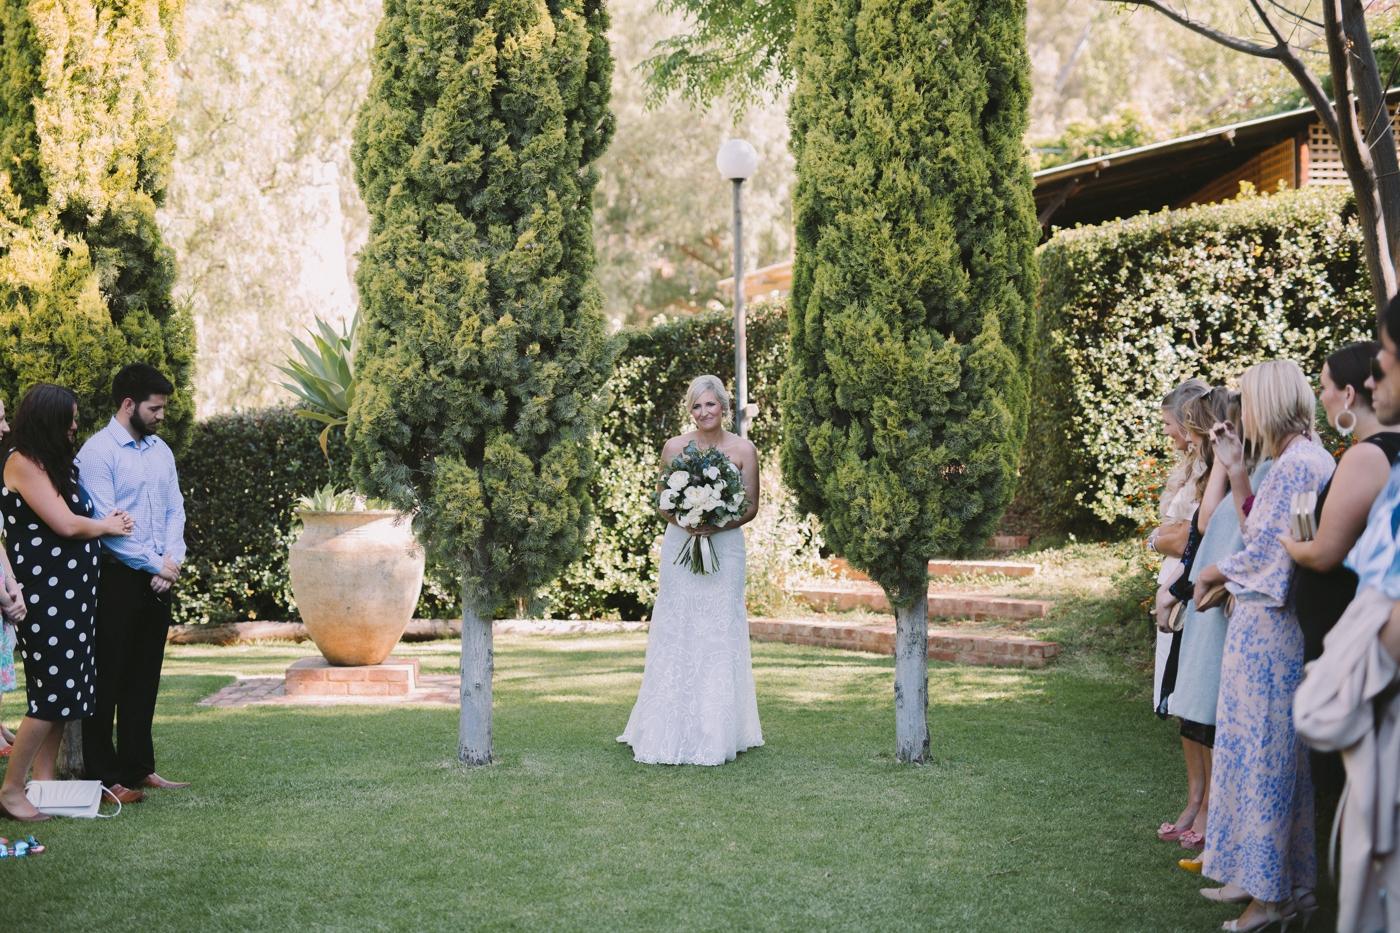 Lauren & Max - Marybank Estate Wedding - Natural wedding photographer in Adelaide - www.katherineschultzphotography.com 58